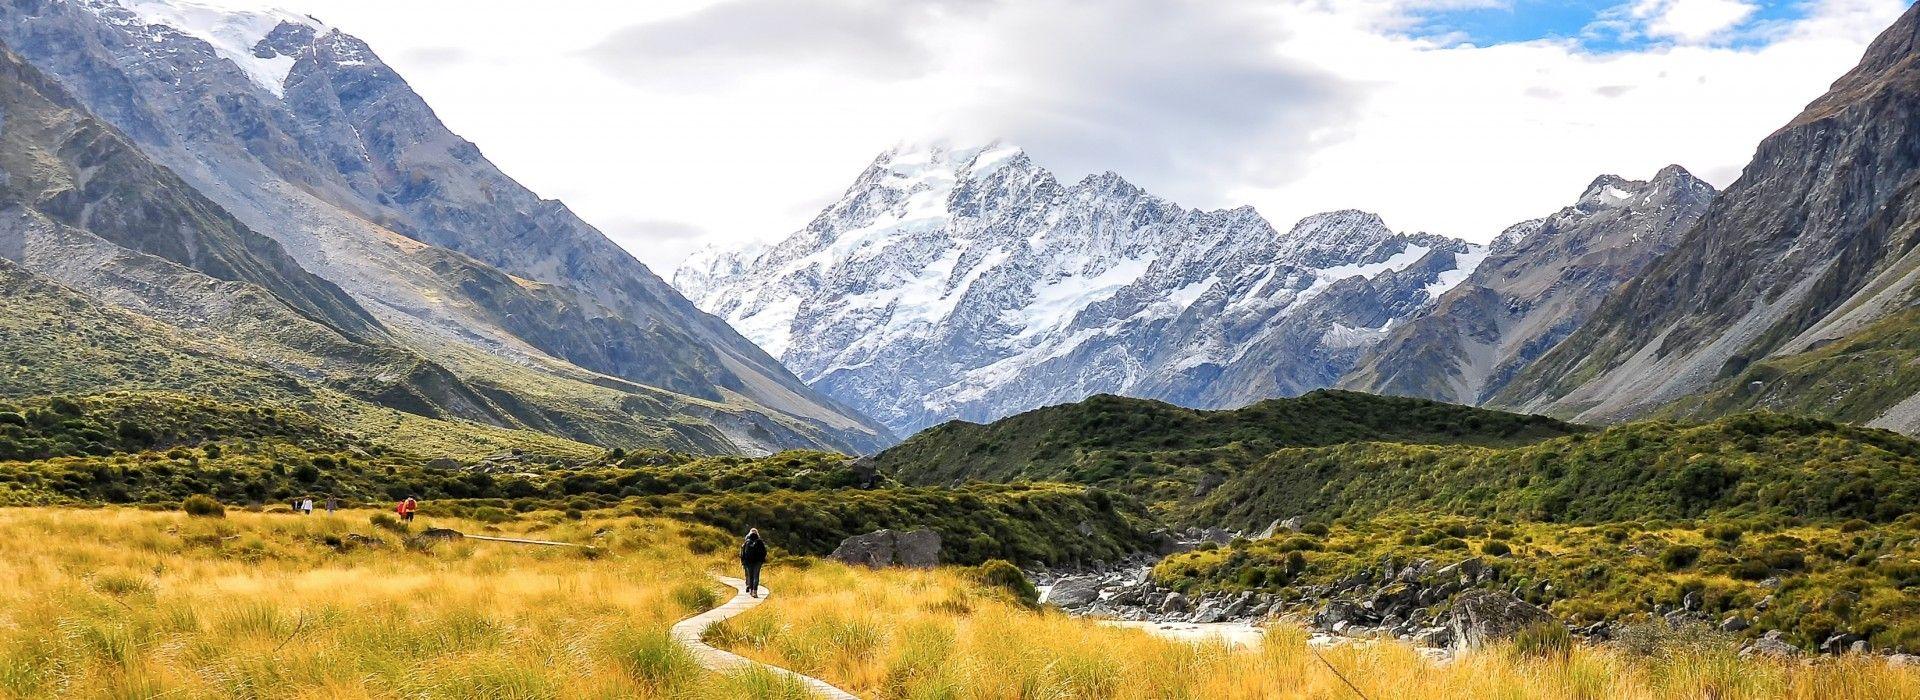 Tongariro National Park Tours